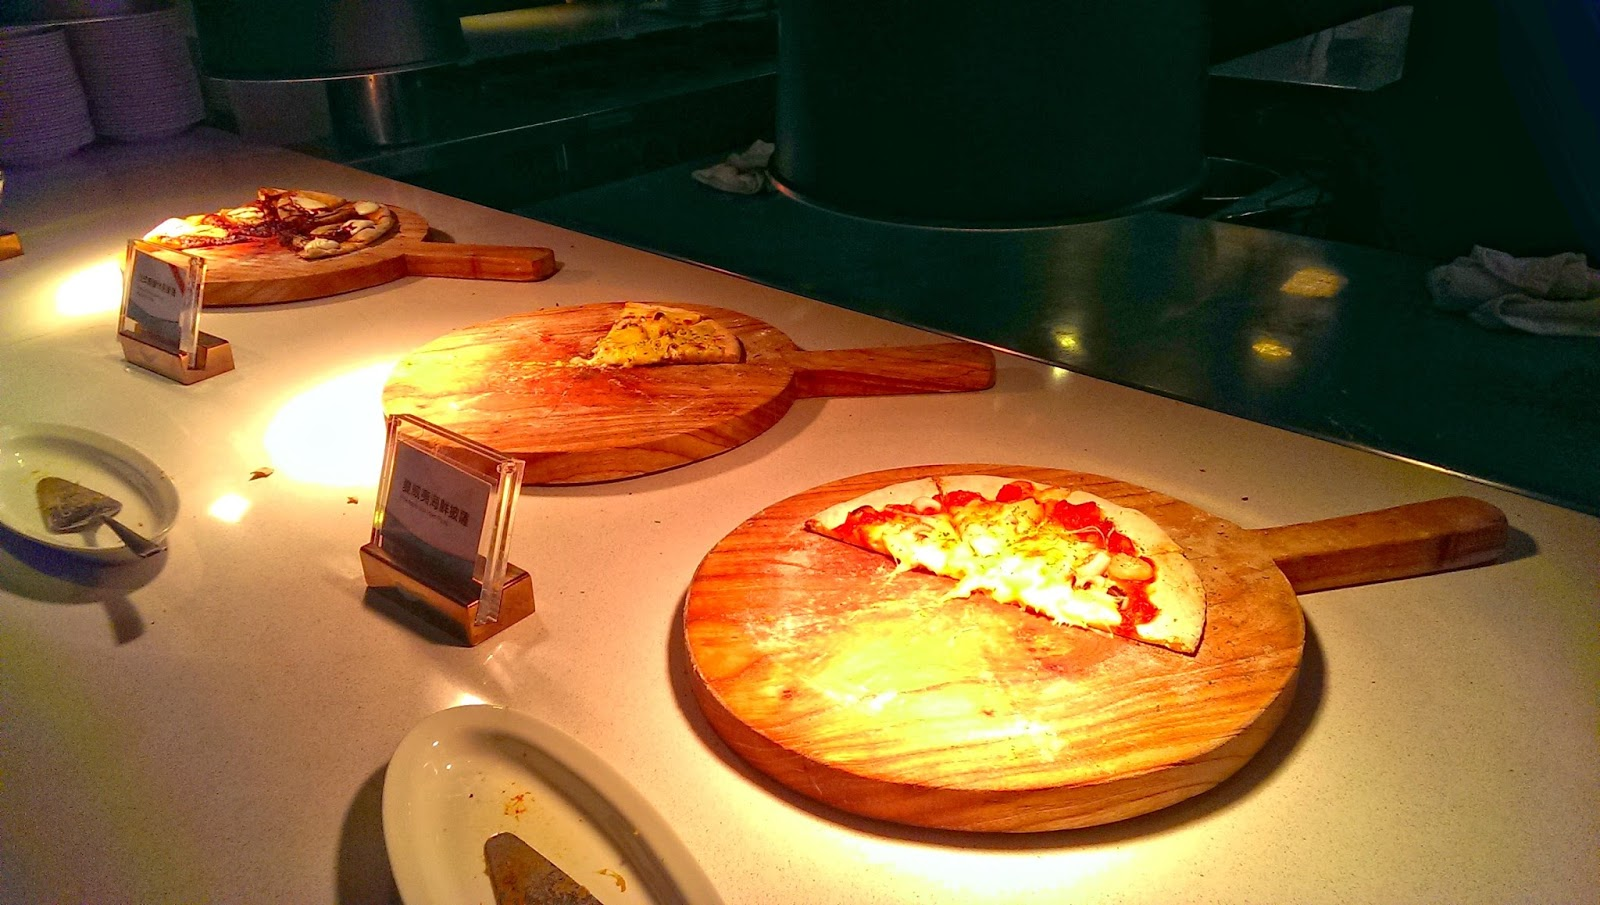 2015 07 01%2B20.05.07 - [食記] 台北京站 - 饗食天堂,有生魚片吃到飽的高級自助餐廳!